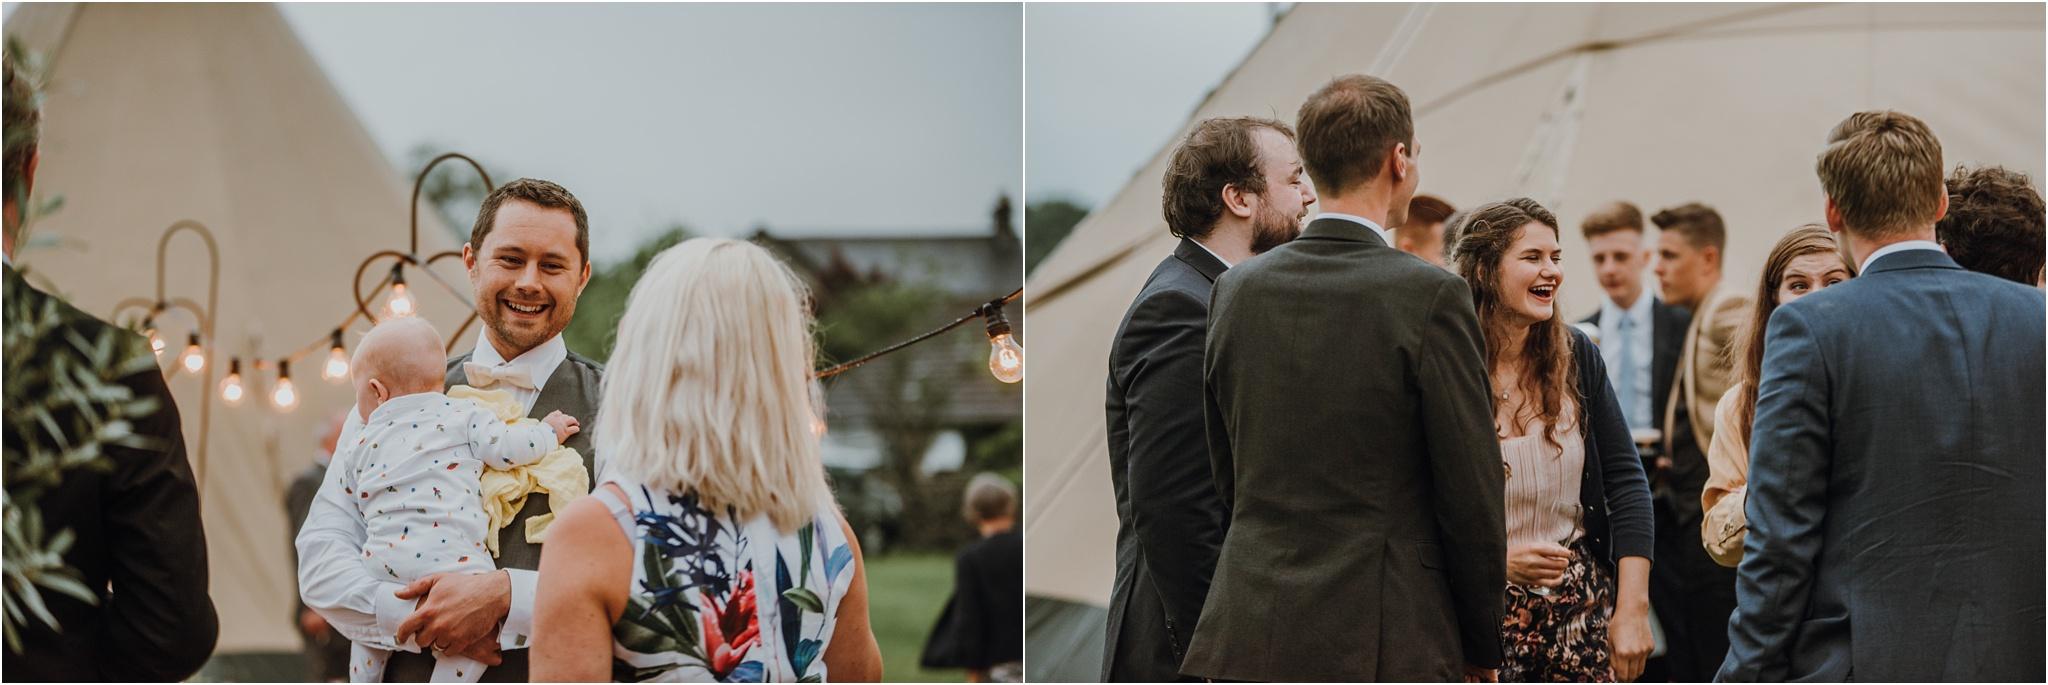 Outdoor-country-wedding-Edinburgh-photographer__0248.jpg